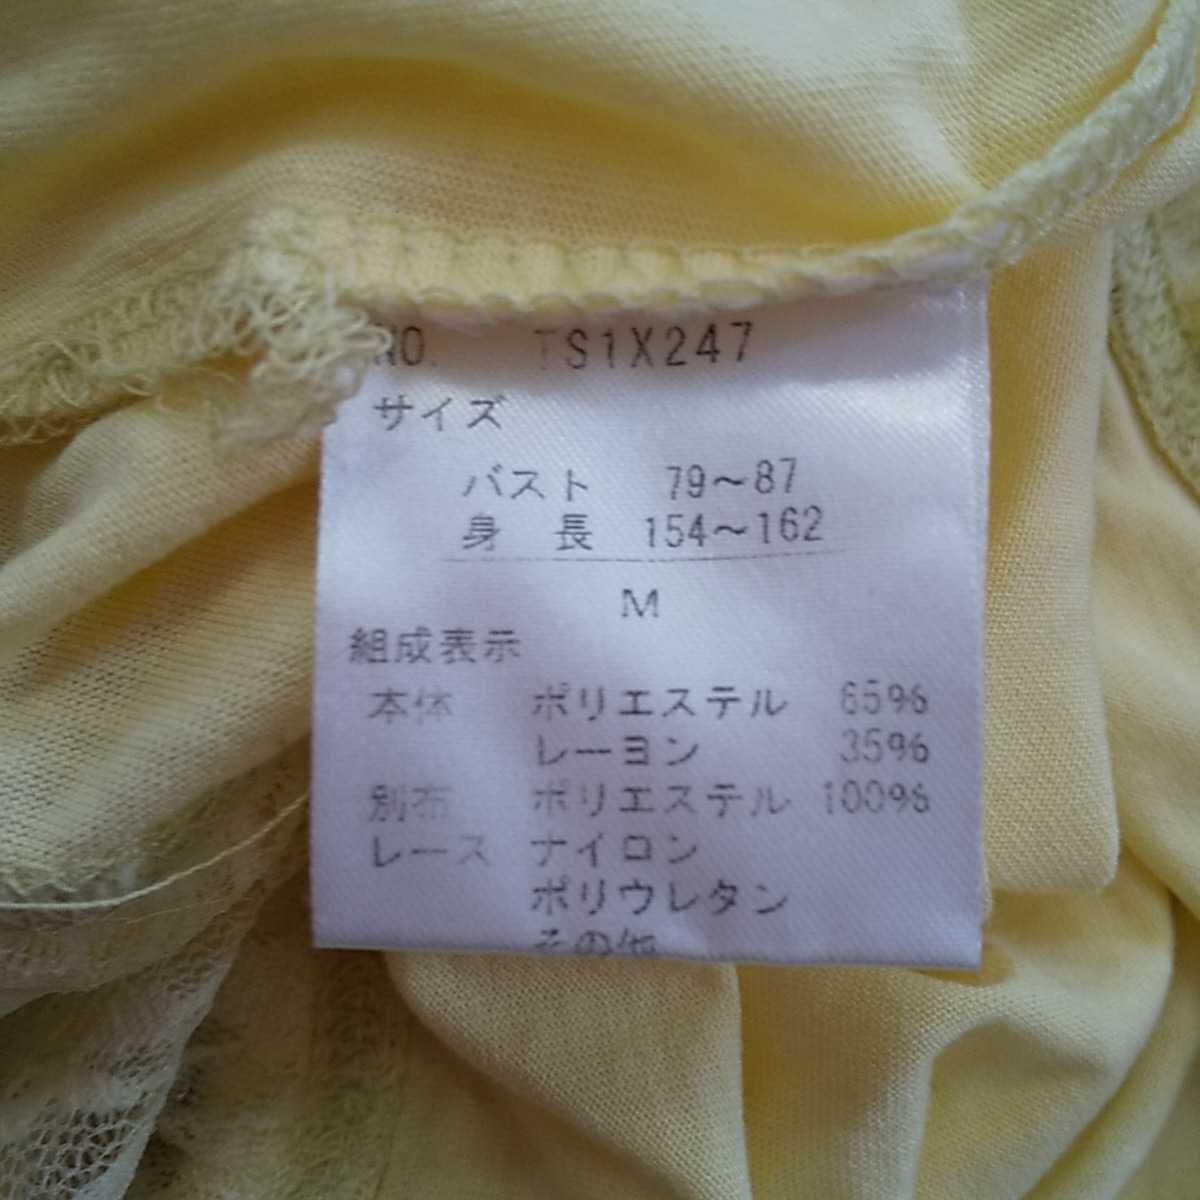 axes femme アクシーズファム淡いクリームイエローレモンビタミンカラー☆可愛いトップスキャミソールリボンMサイズ女性用タンクトップ夏